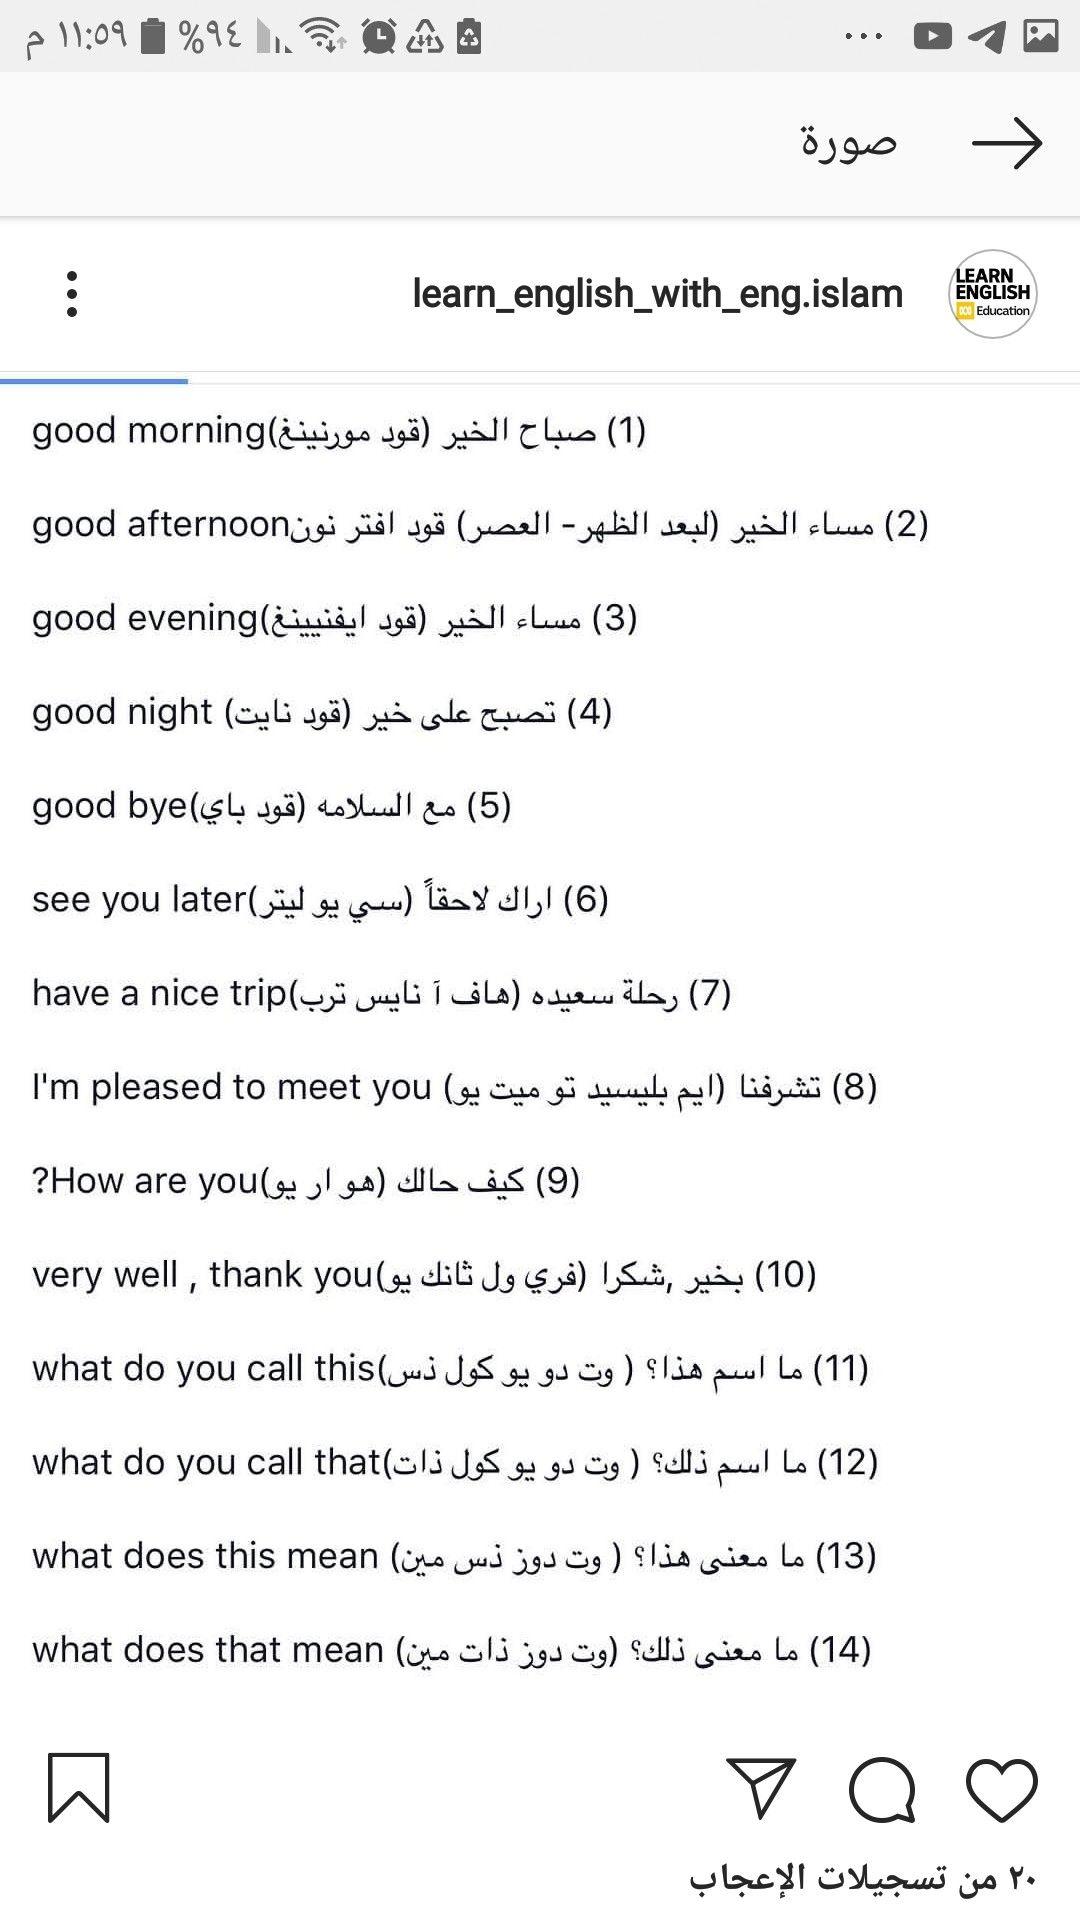 Pin Van زهرة اللوتس Op Arabic English